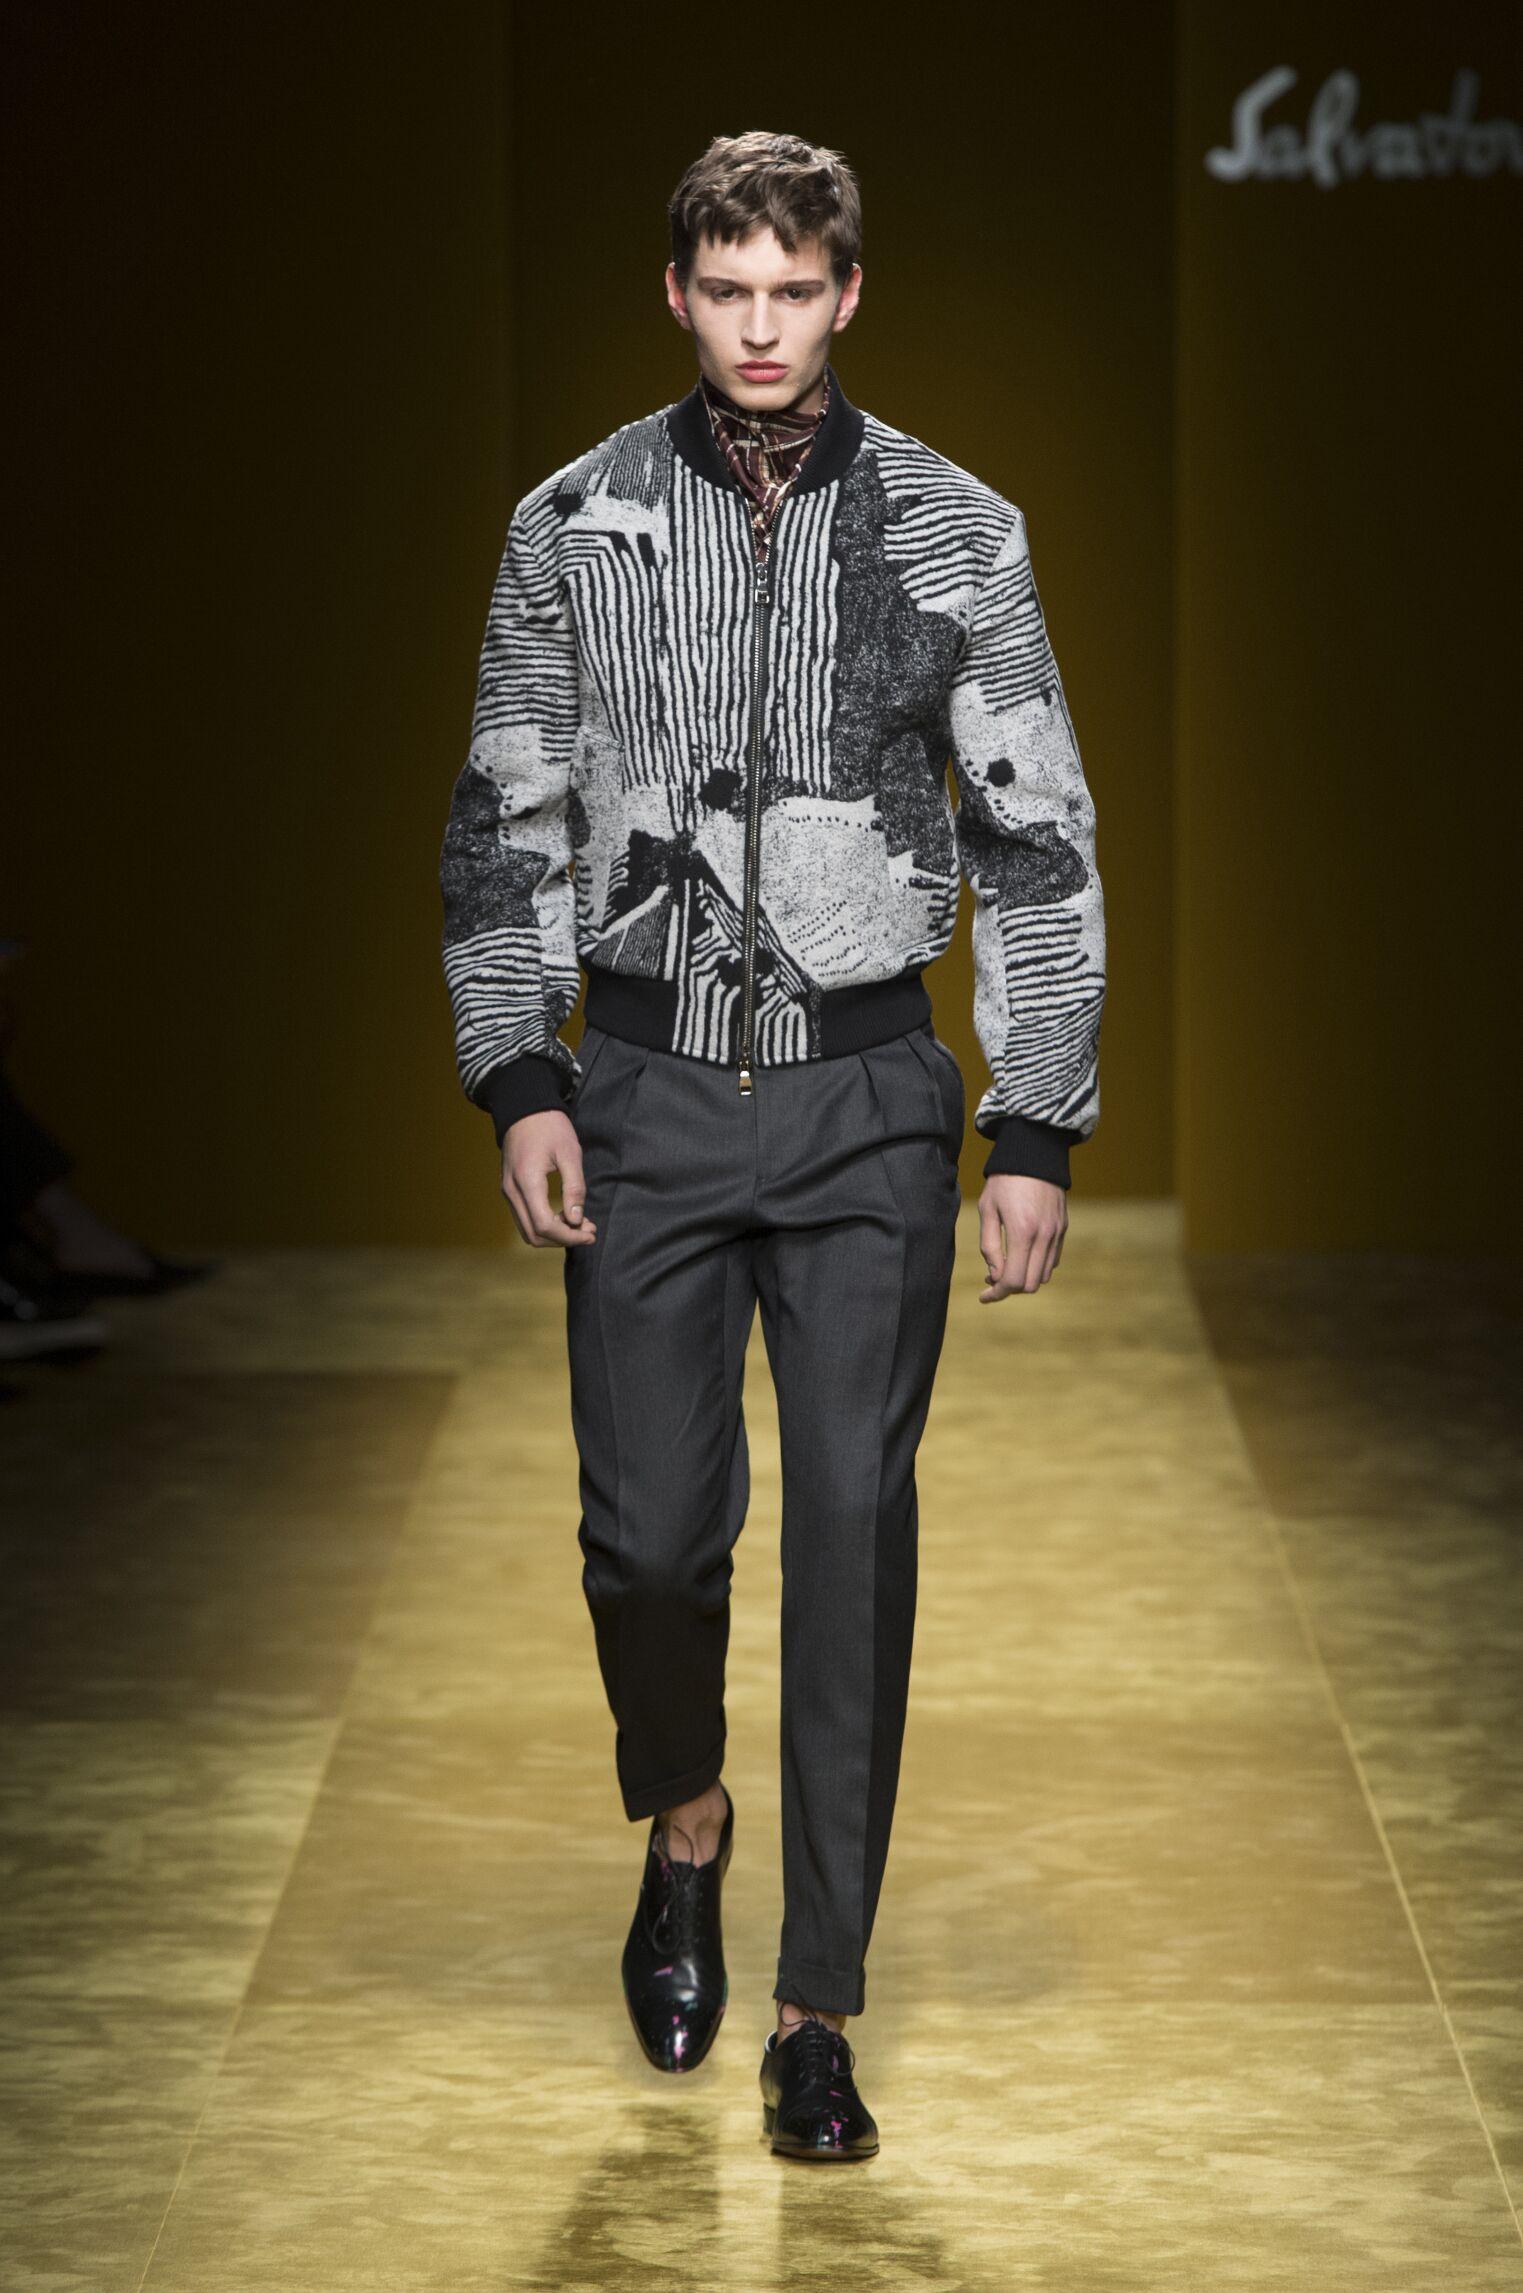 2016 Catwalk Salvatore Ferragamo Winter